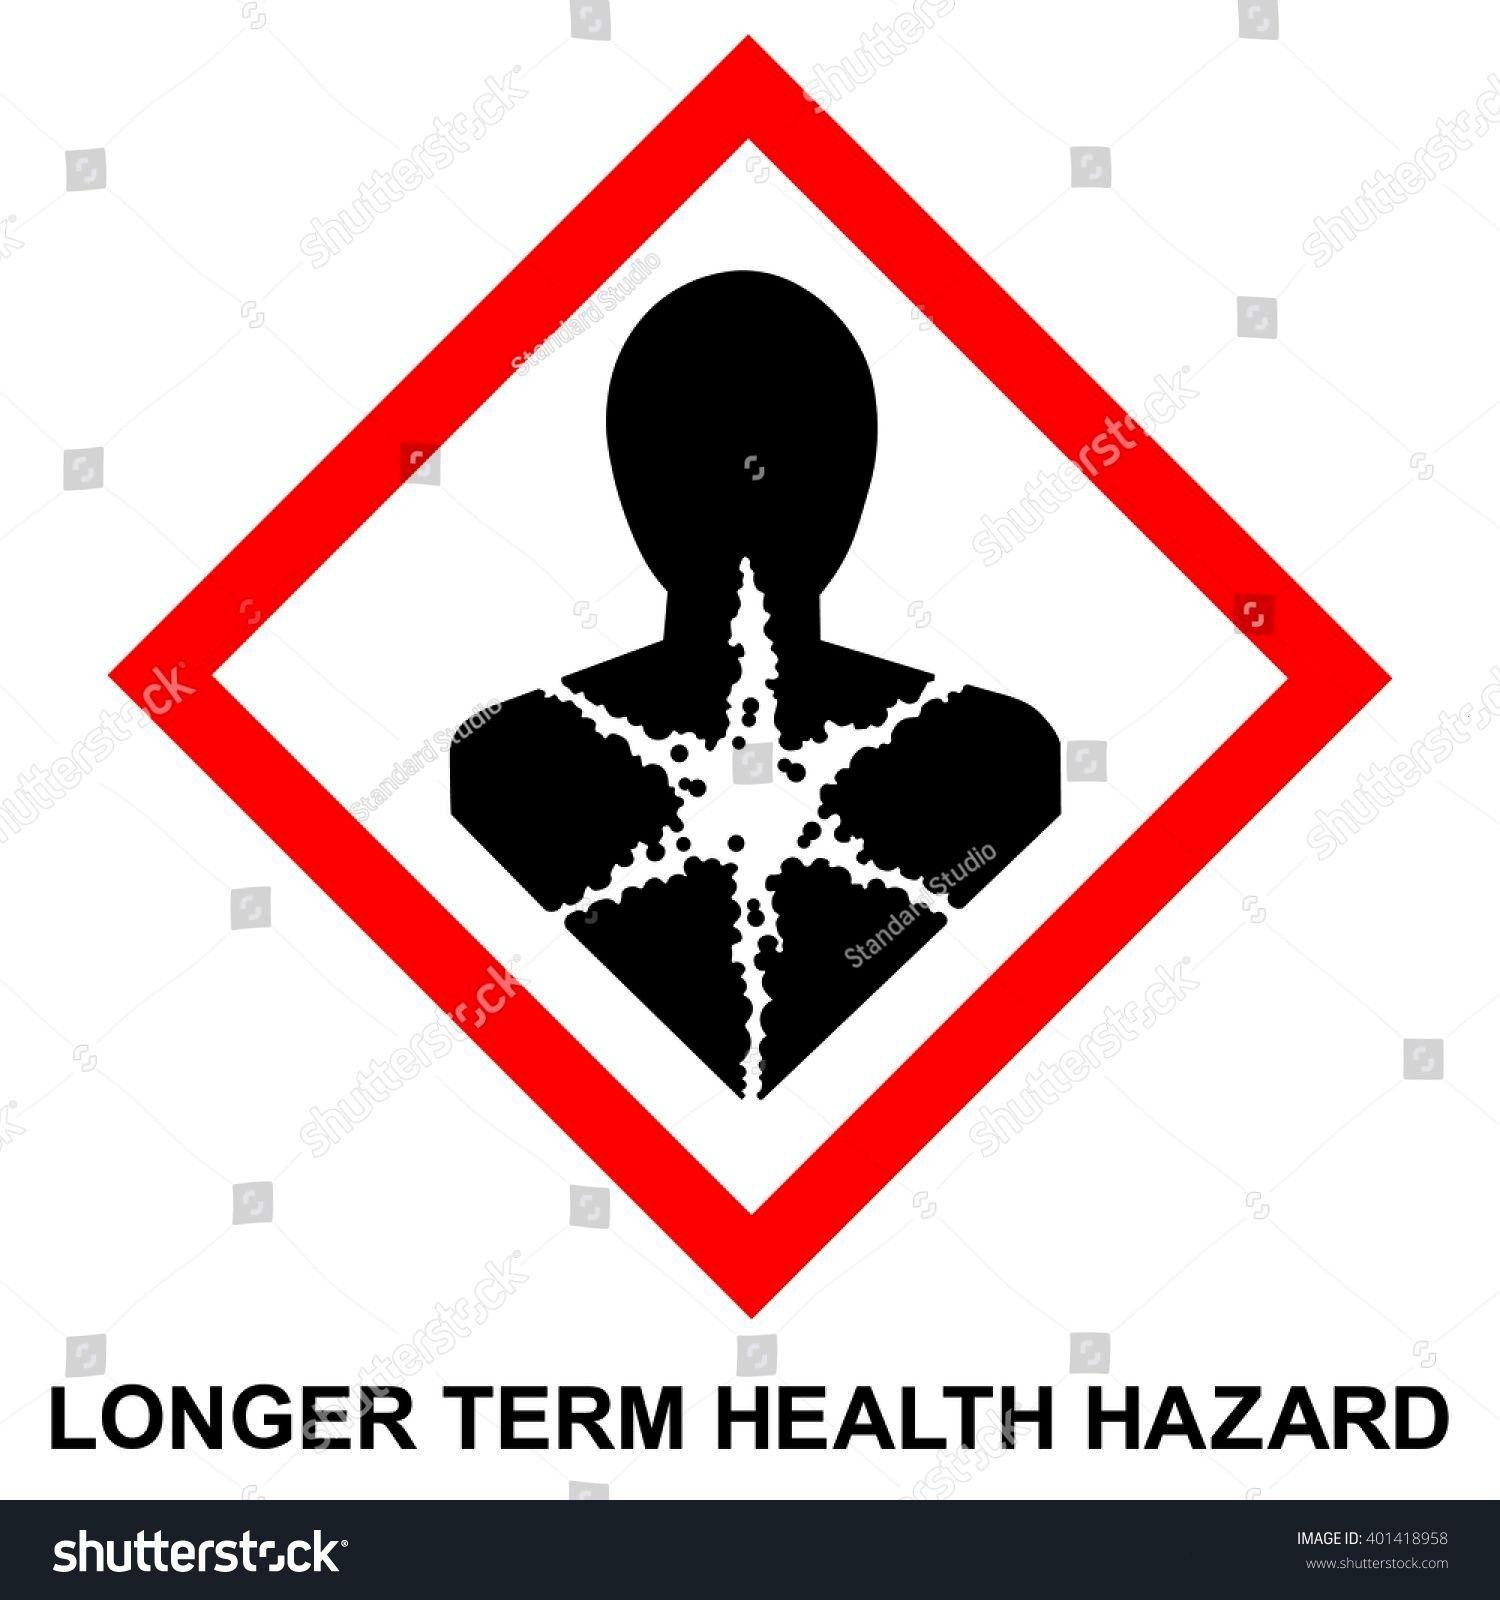 hazard pictogram  LONGER TERM HEALTH HAZARD  hazard warning sign LONGER TERM HEALTH HAZARD  isolated vector illustration GHS hazard pictogram  LONGER TERM HEALTH HAZARD...